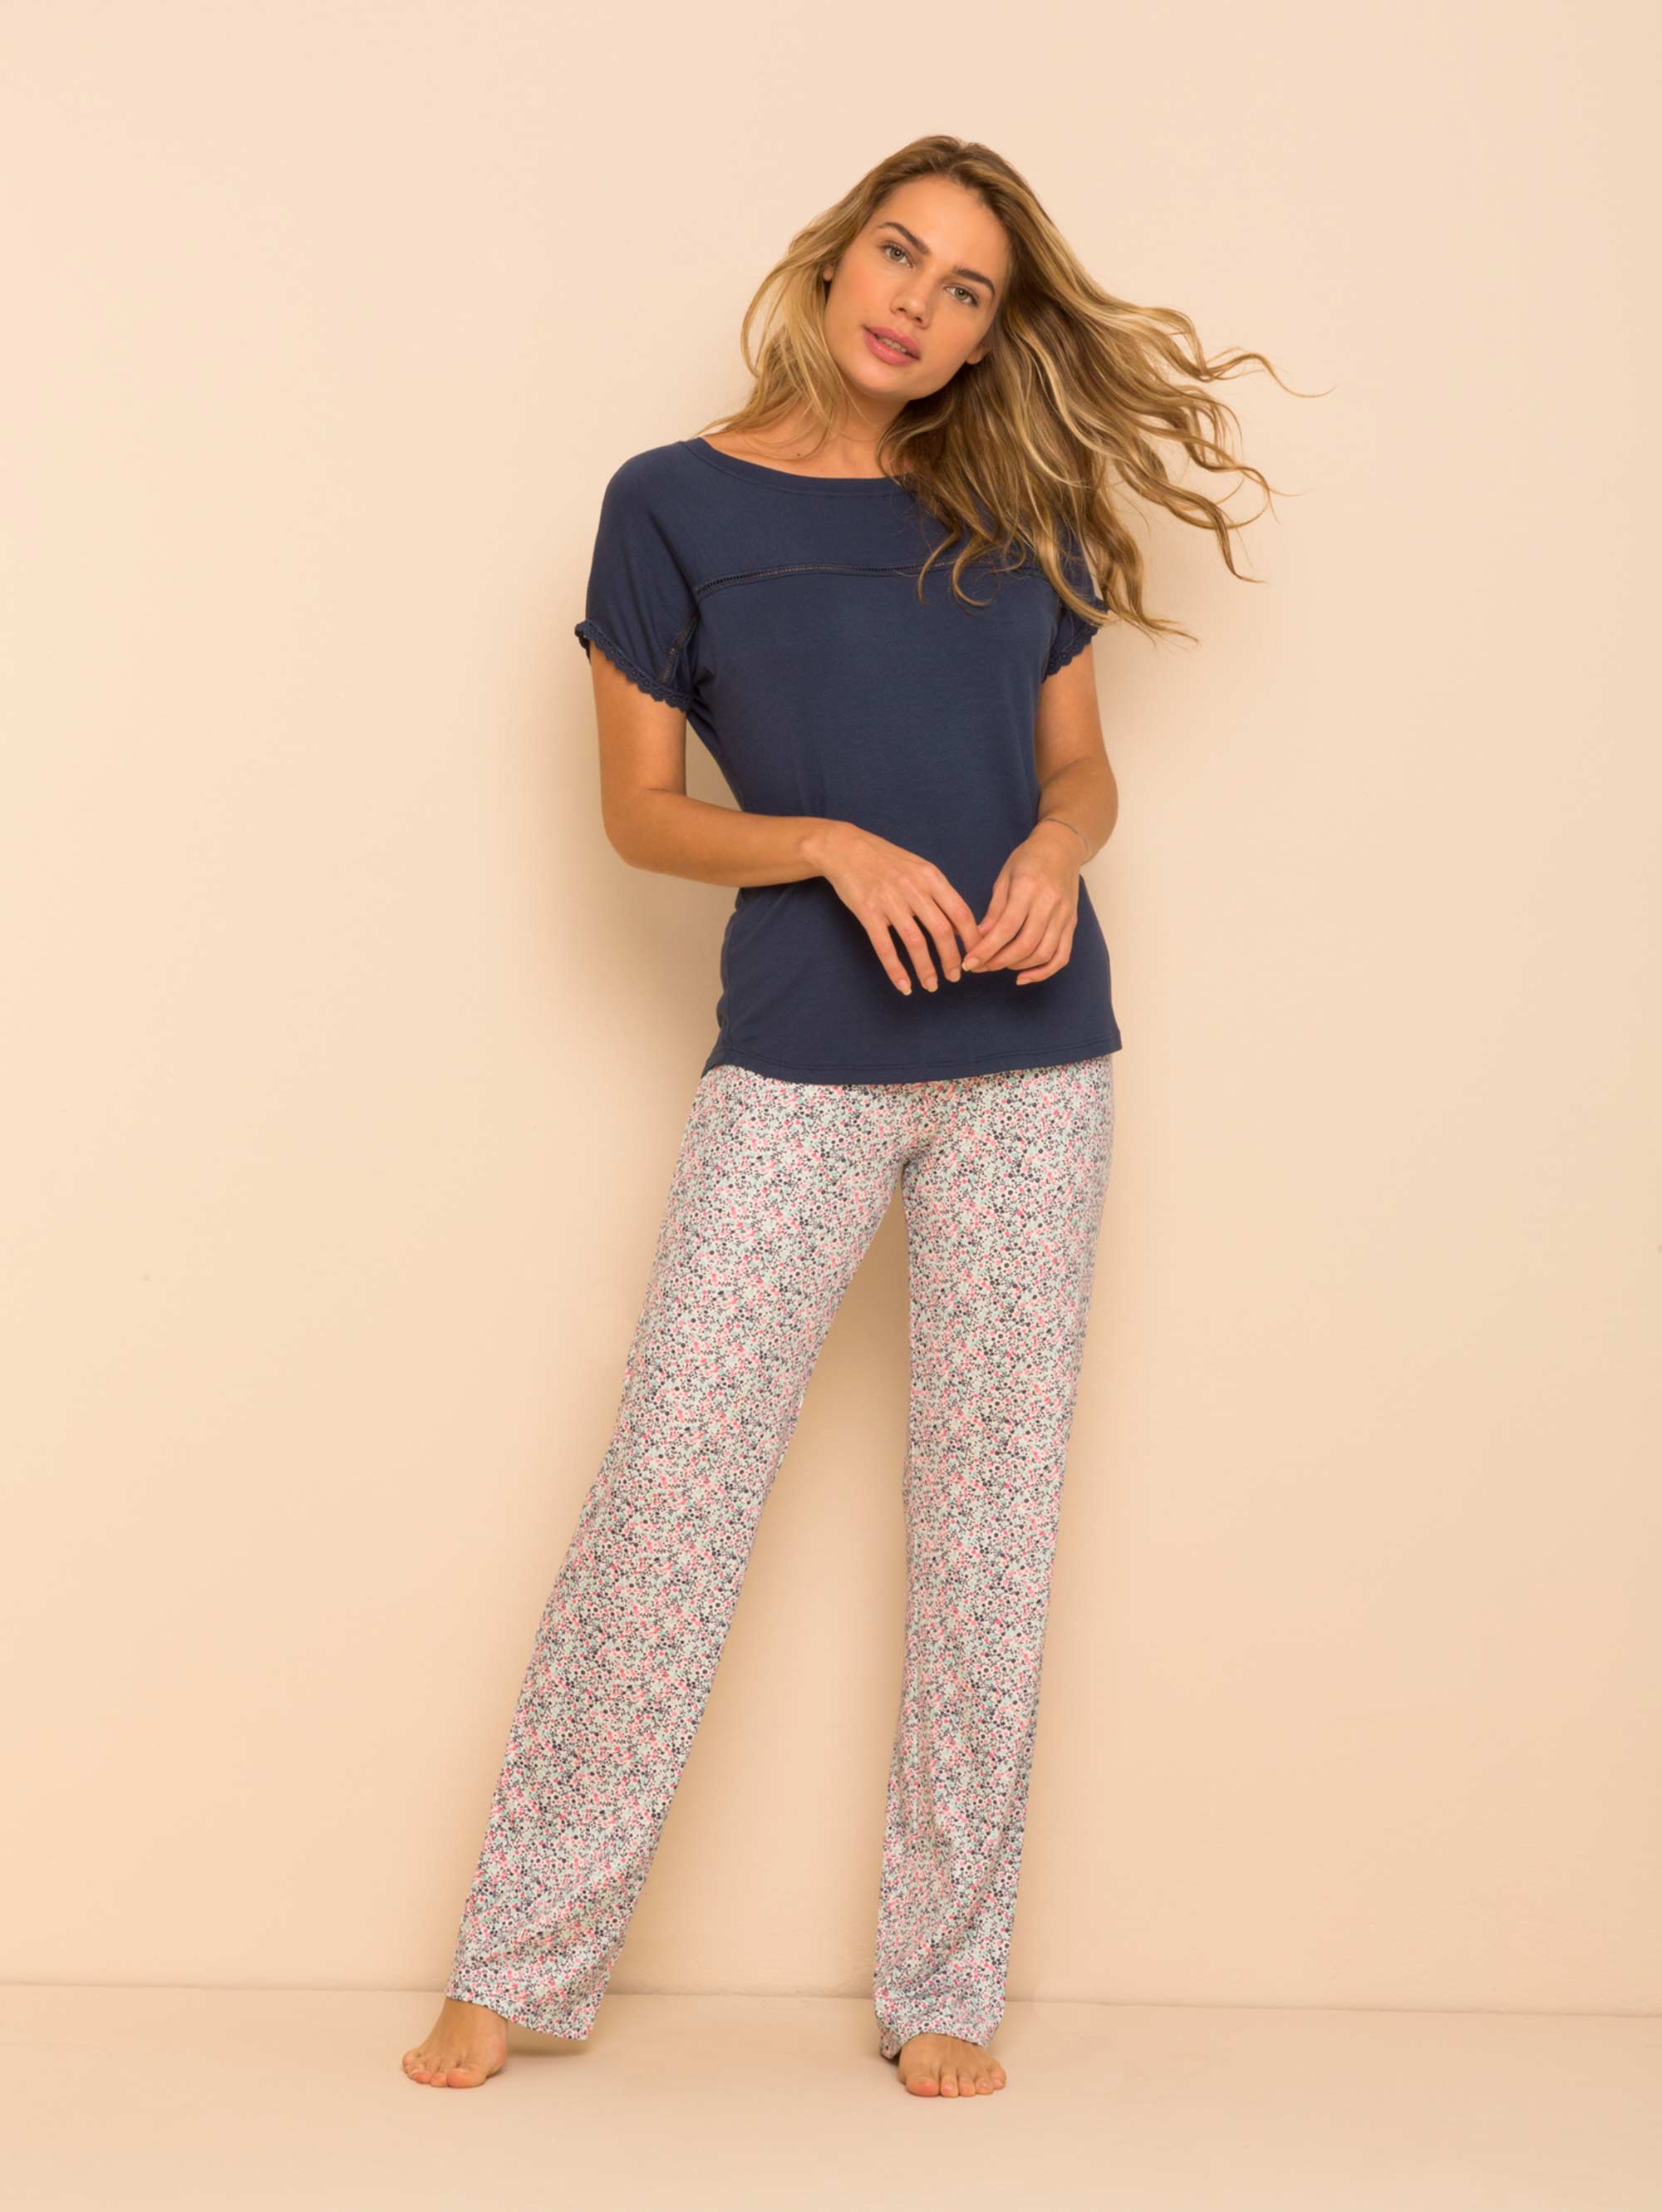 Pijama-Feminino-Manga-Curta-Giverny-04.04.0482